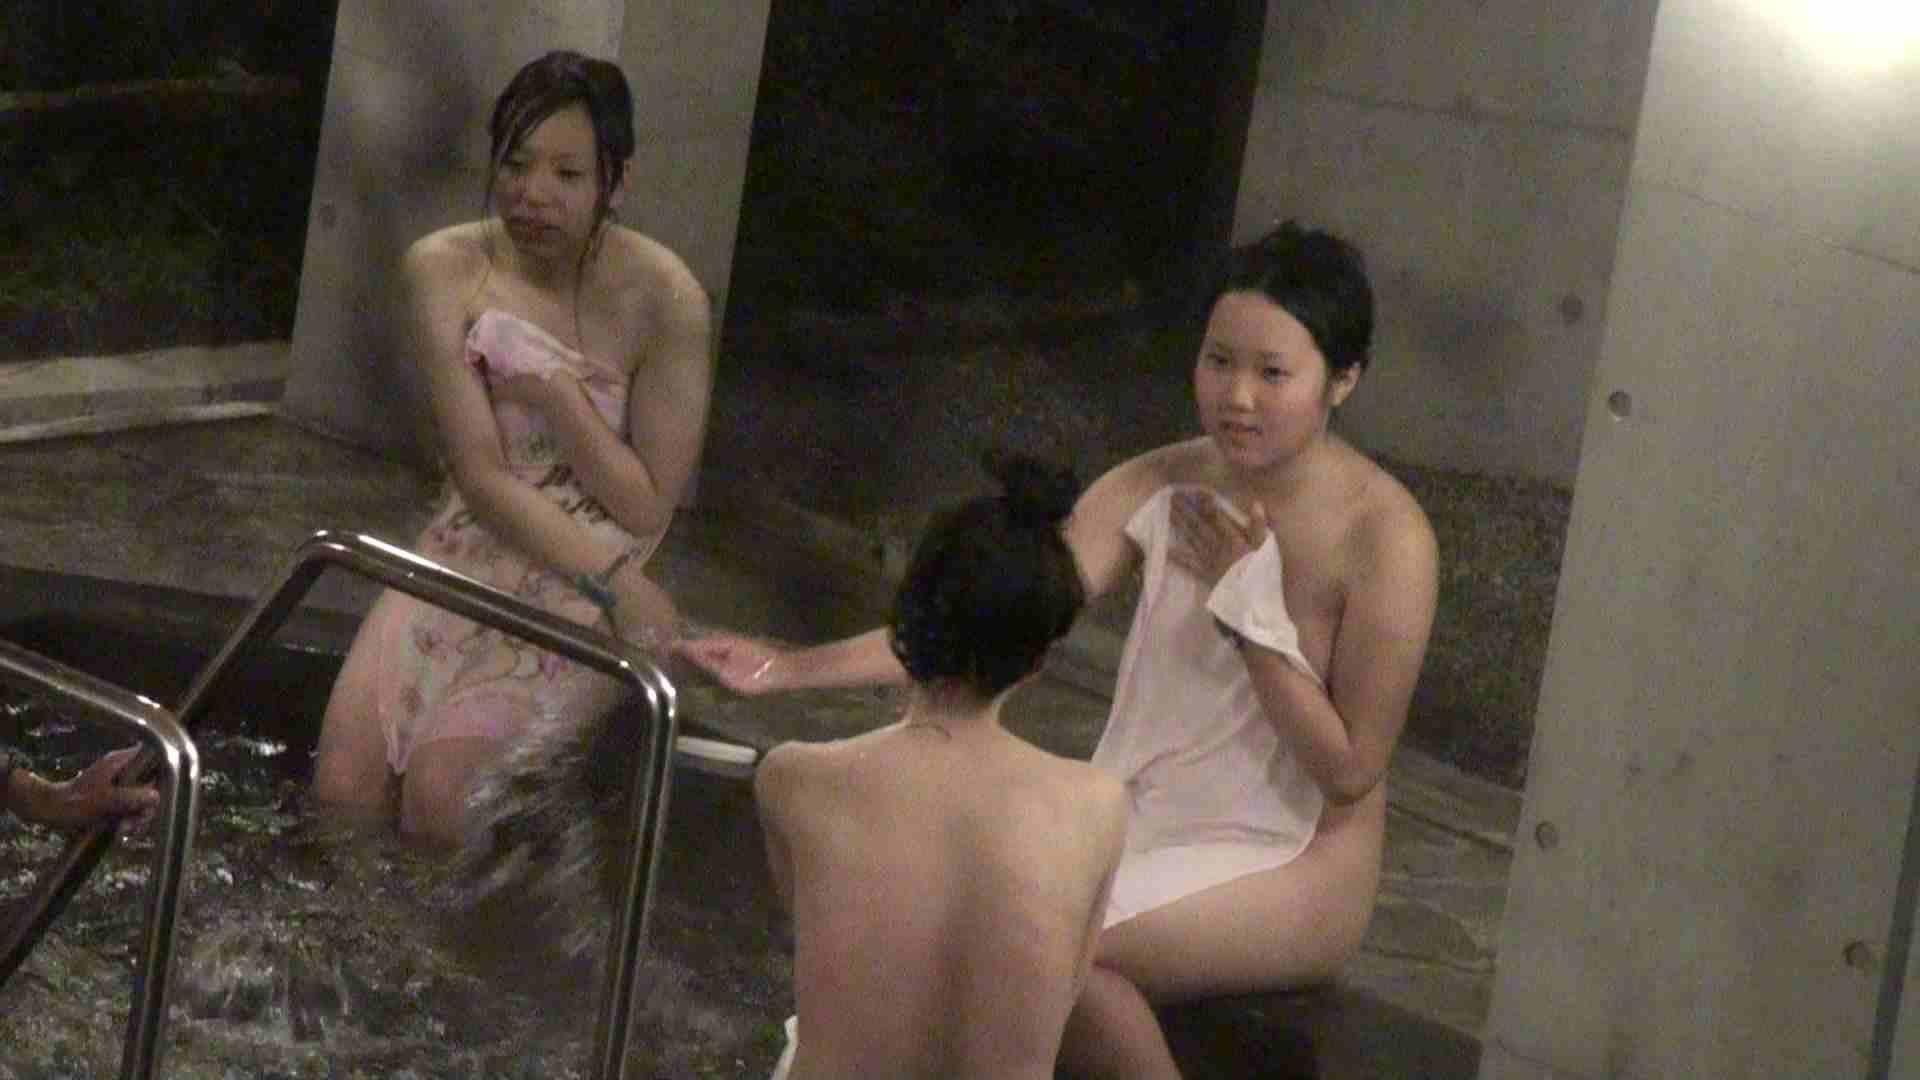 Aquaな露天風呂Vol.383 OLセックス 覗き性交動画流出 103画像 80